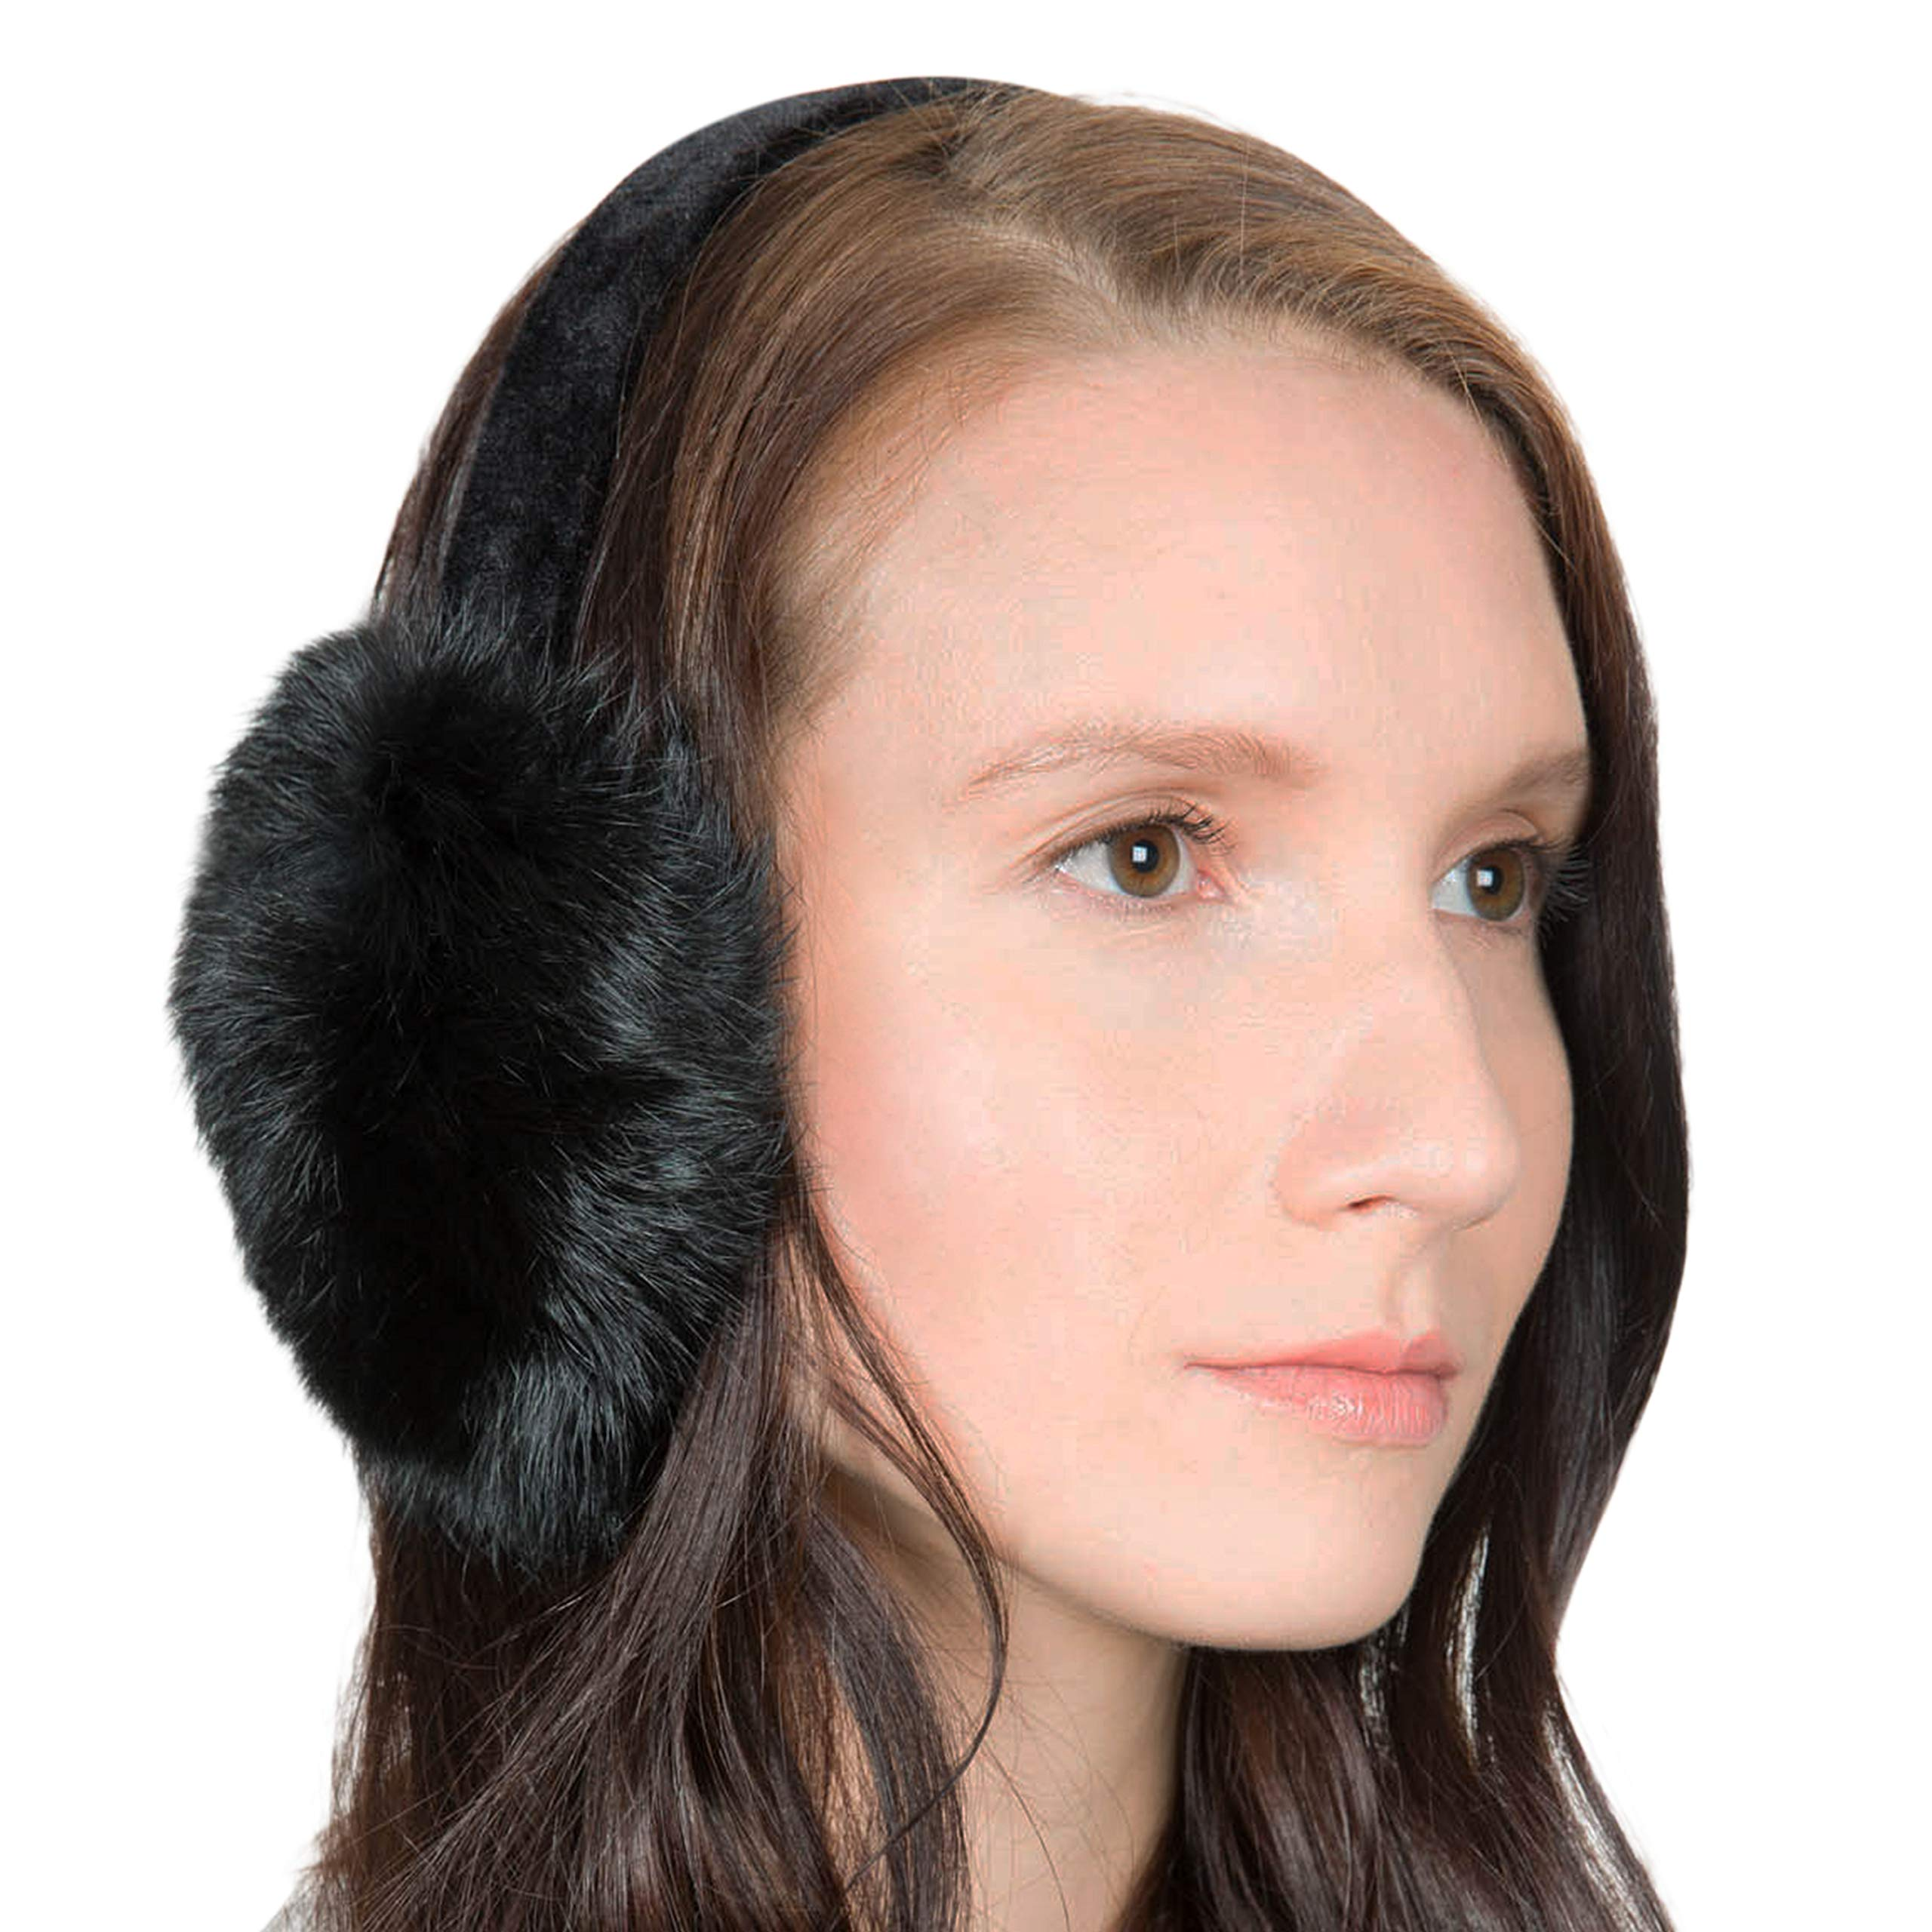 OBURLA Fur Earmuffs   Luxurious Real Fur Over Ear Warmers with Headband (Rabbit Fur, Black) by OBURLA